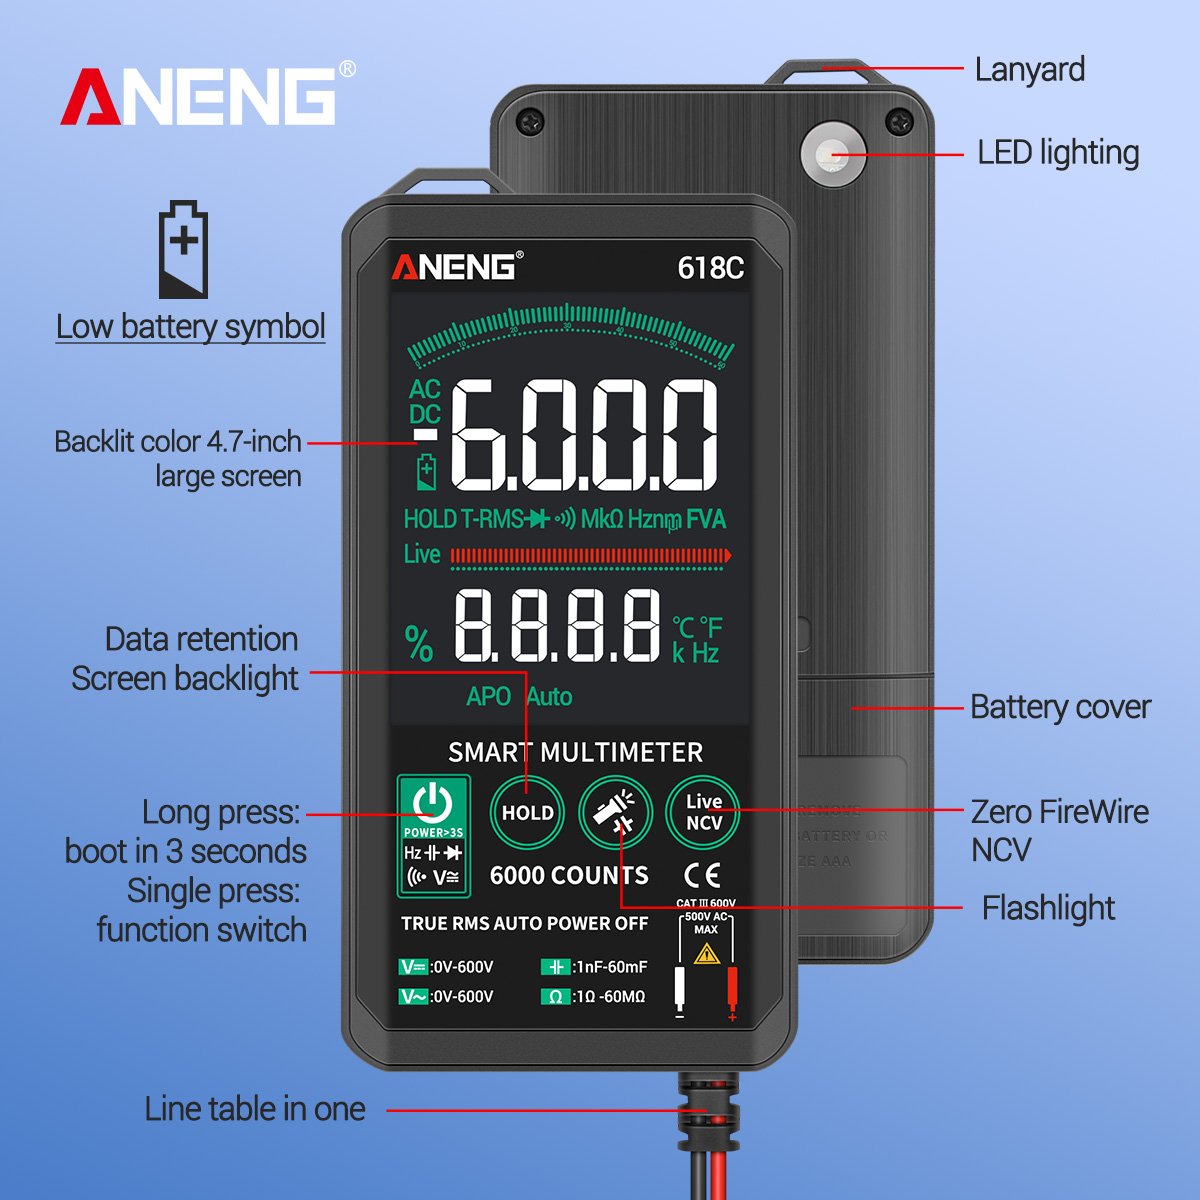 home improvement : ATTEN ST-862D Lead-free Hot Air Gun Soldering Station Intelligent Digital Display 1000W Rework Station for PCB Chip Soldering